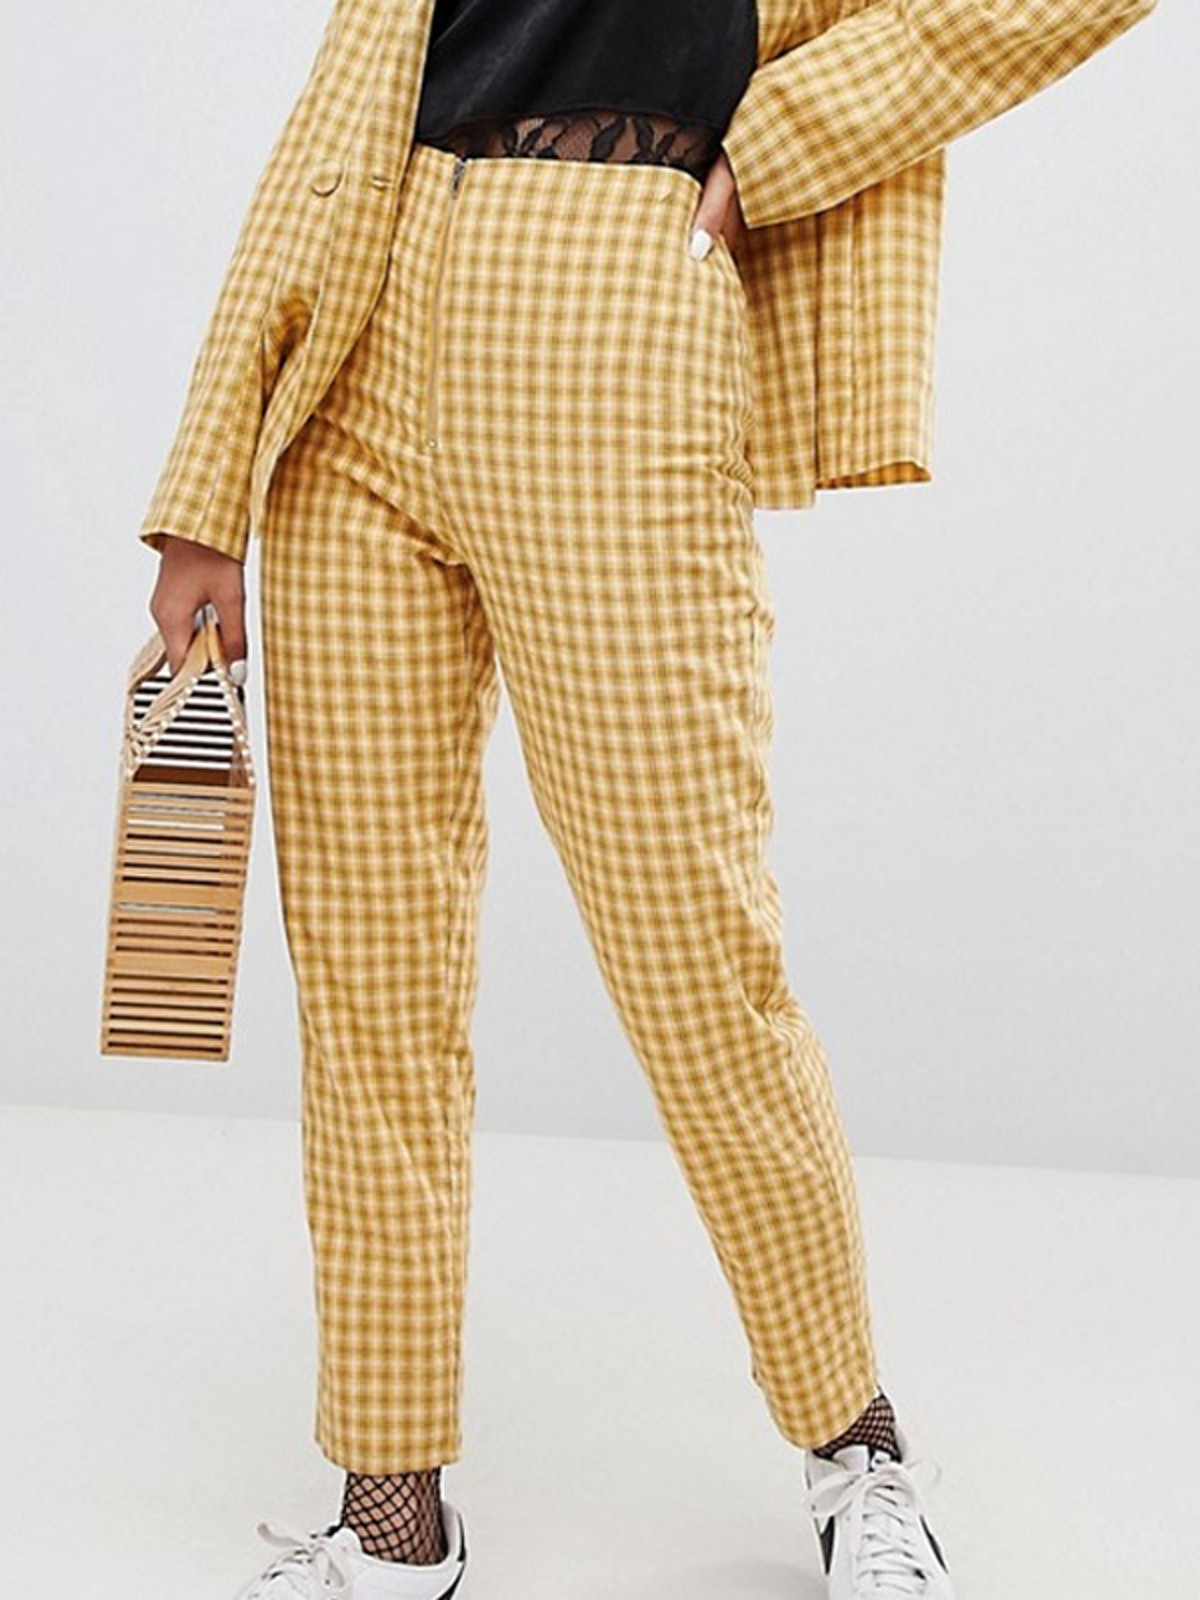 Wild Honey Zip Front Pants in Check Co-Ord